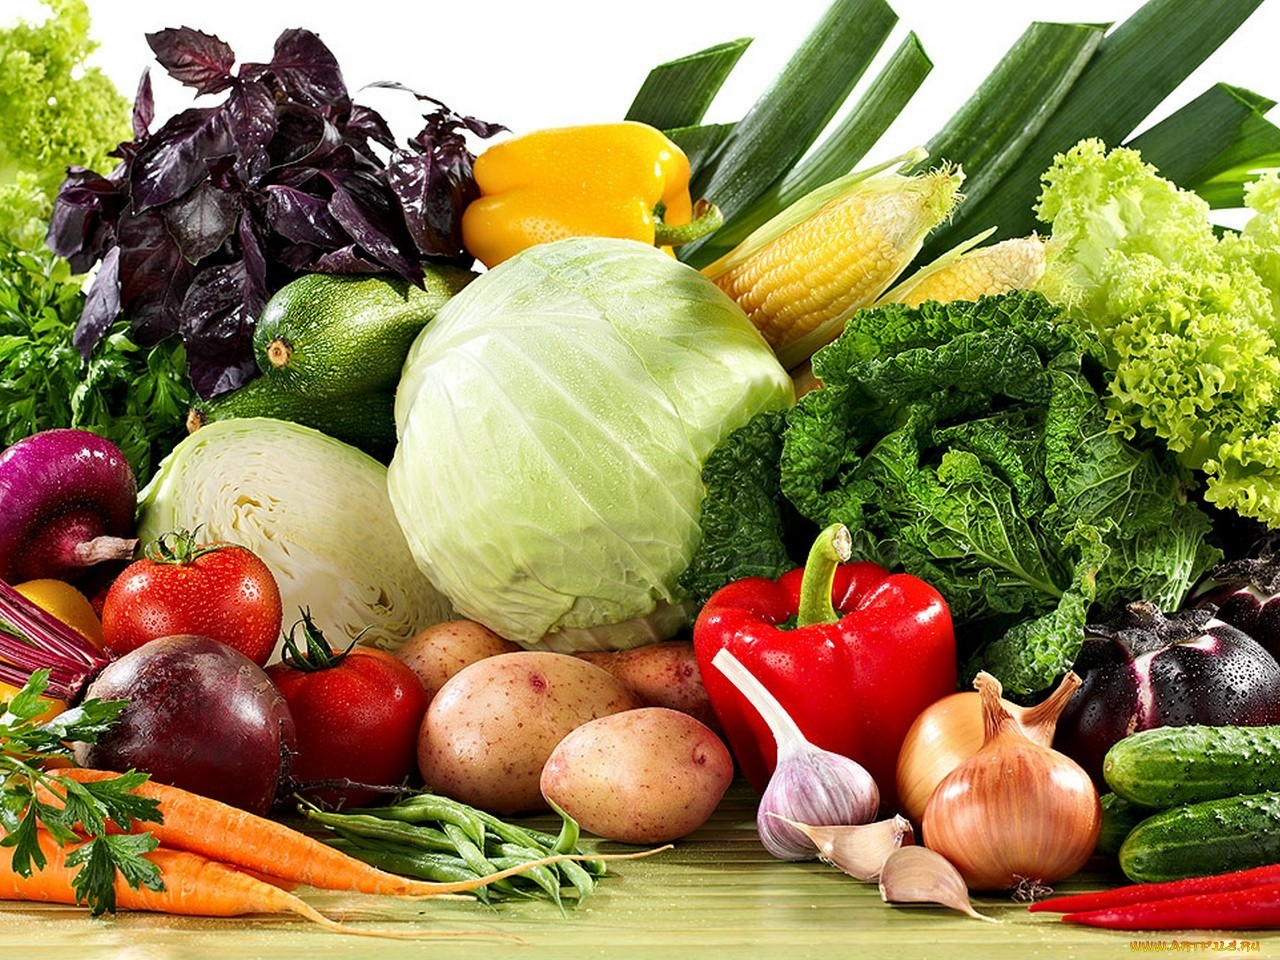 Харьковчане останутся без свежих витаминов